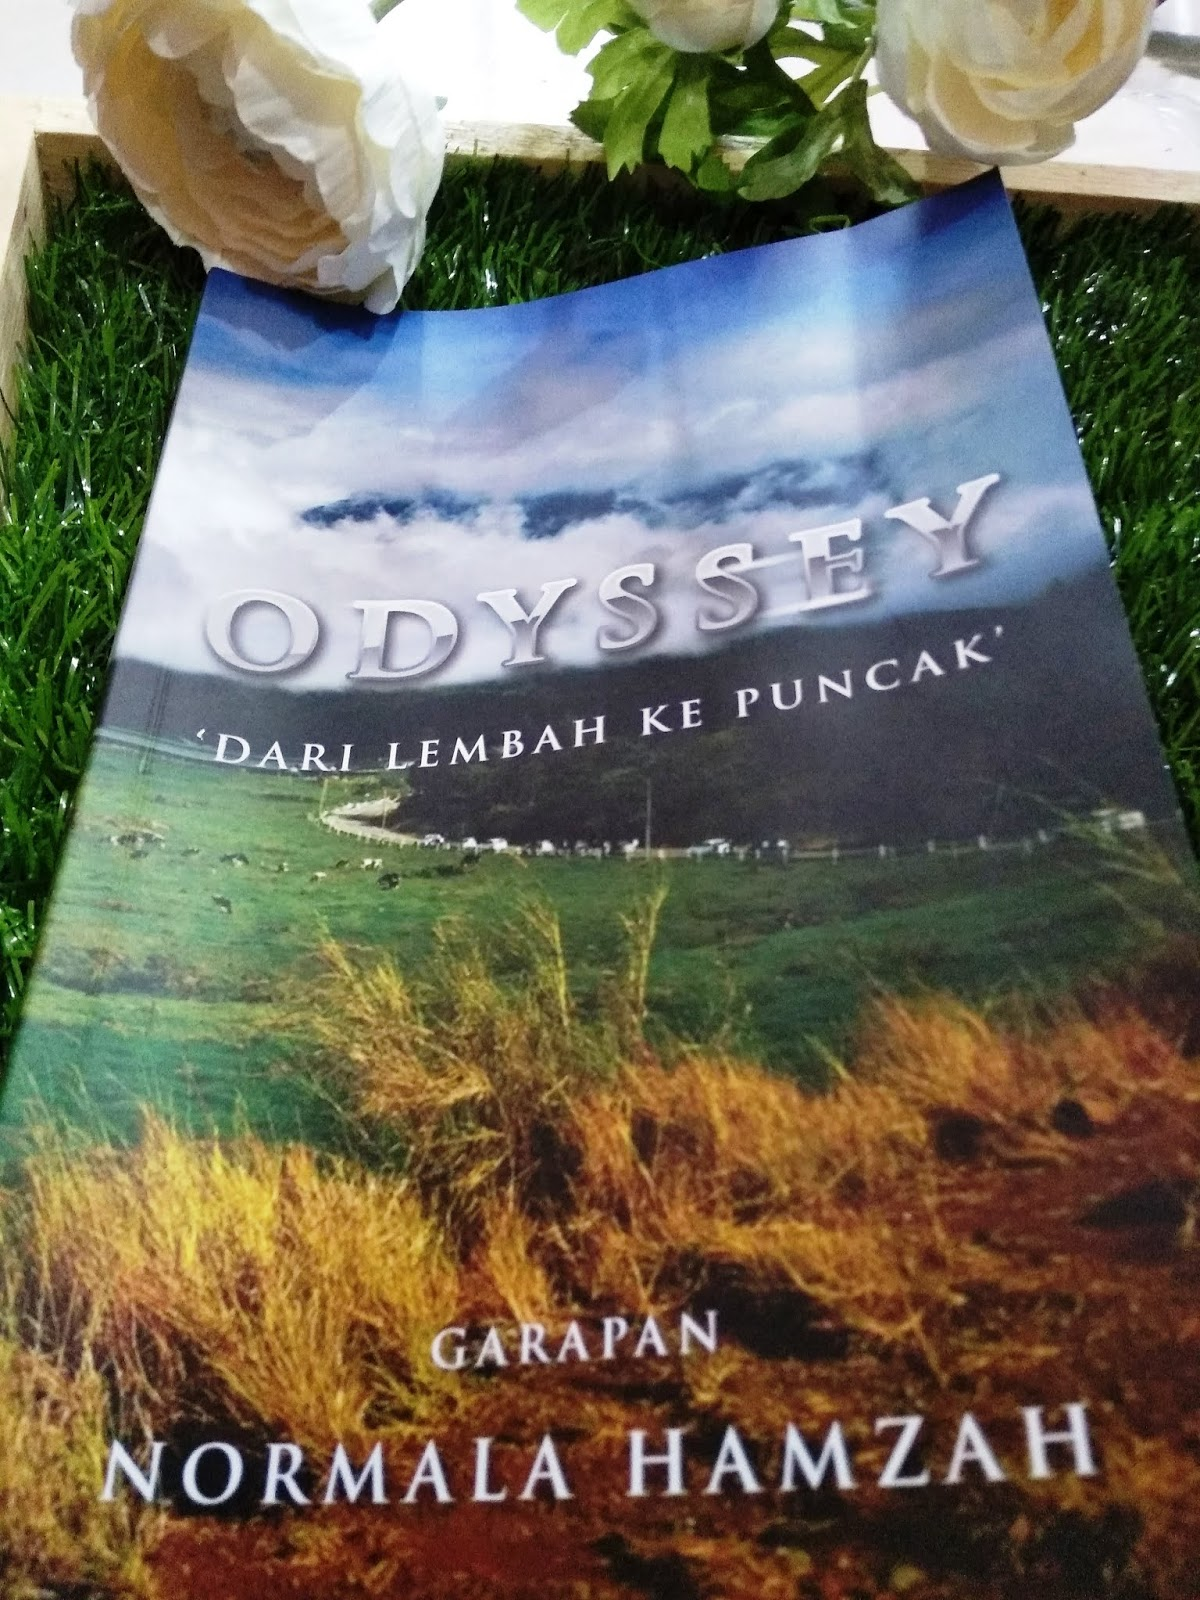 Odyssey Dari Lembah Ke Puncak - Kisah Inspirasi Hidup Semua Wajib Baca